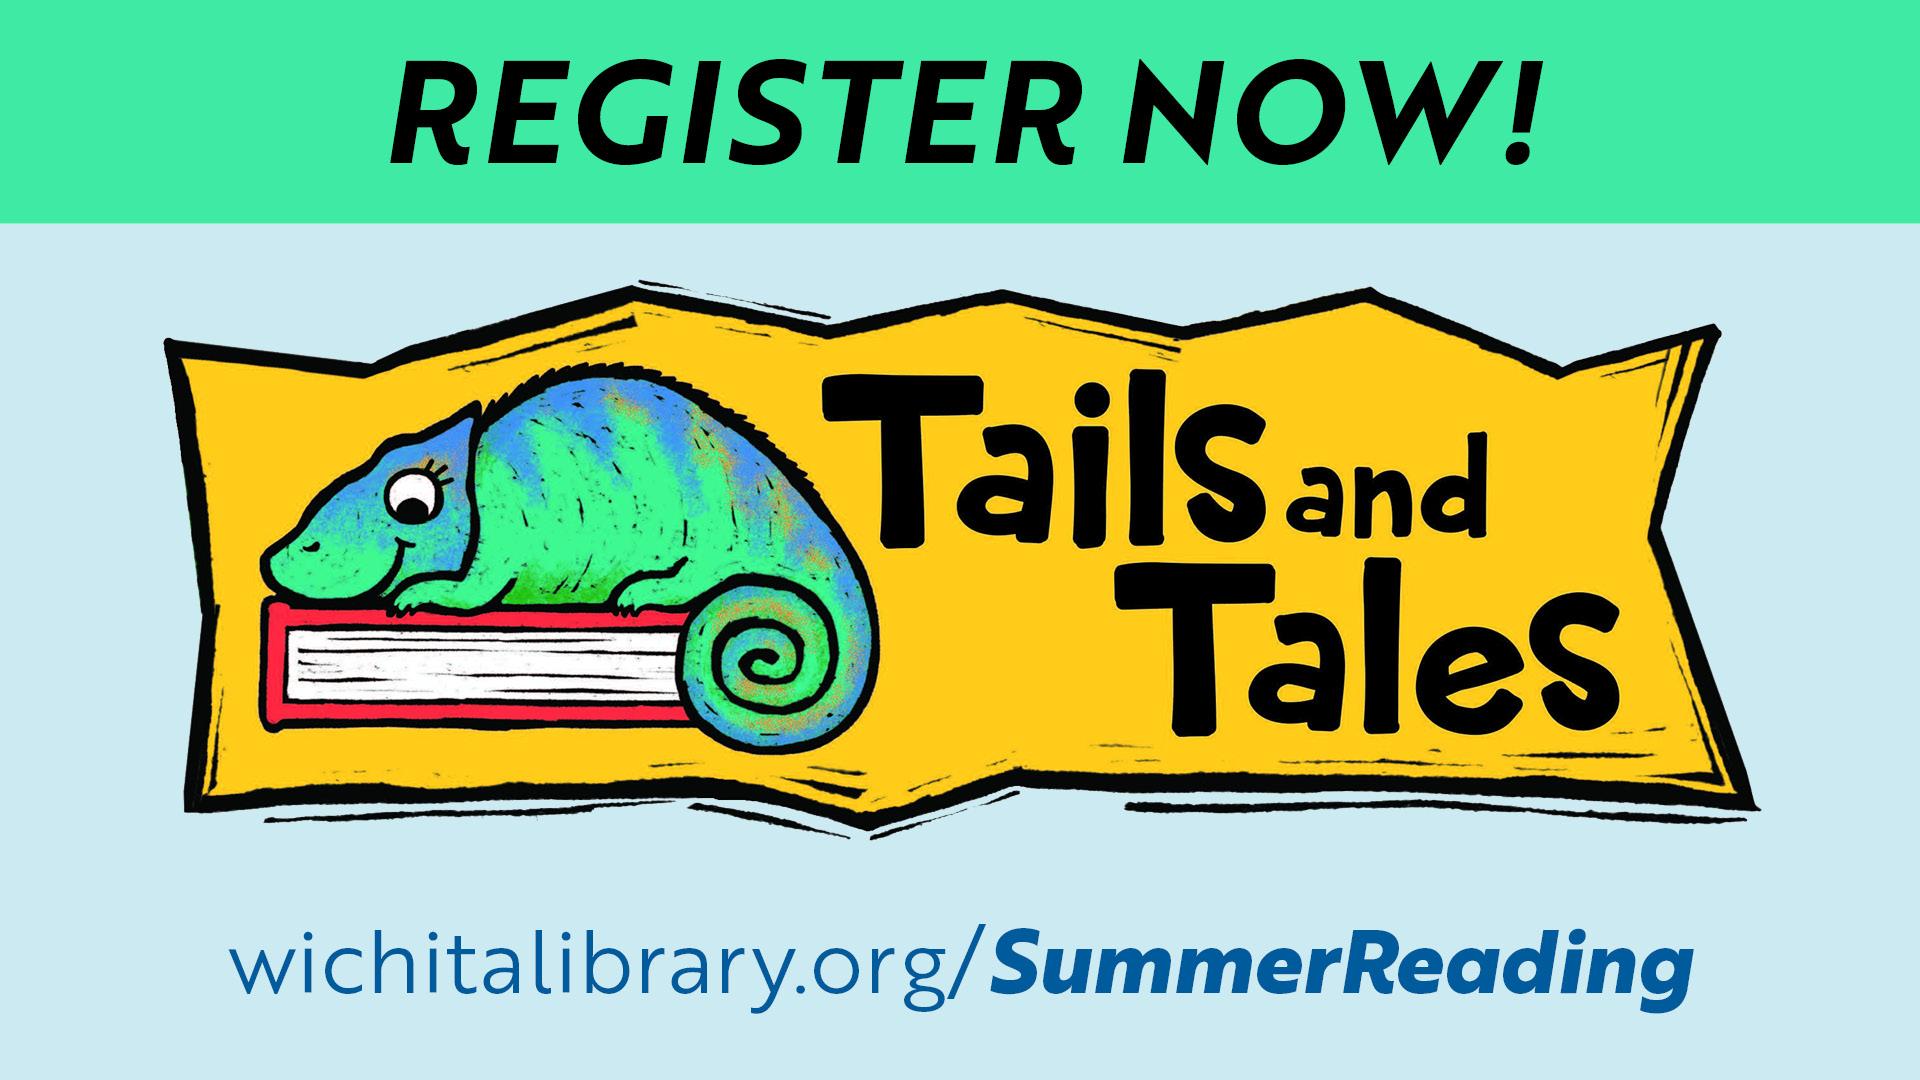 Summer Reading Wichita Public Library